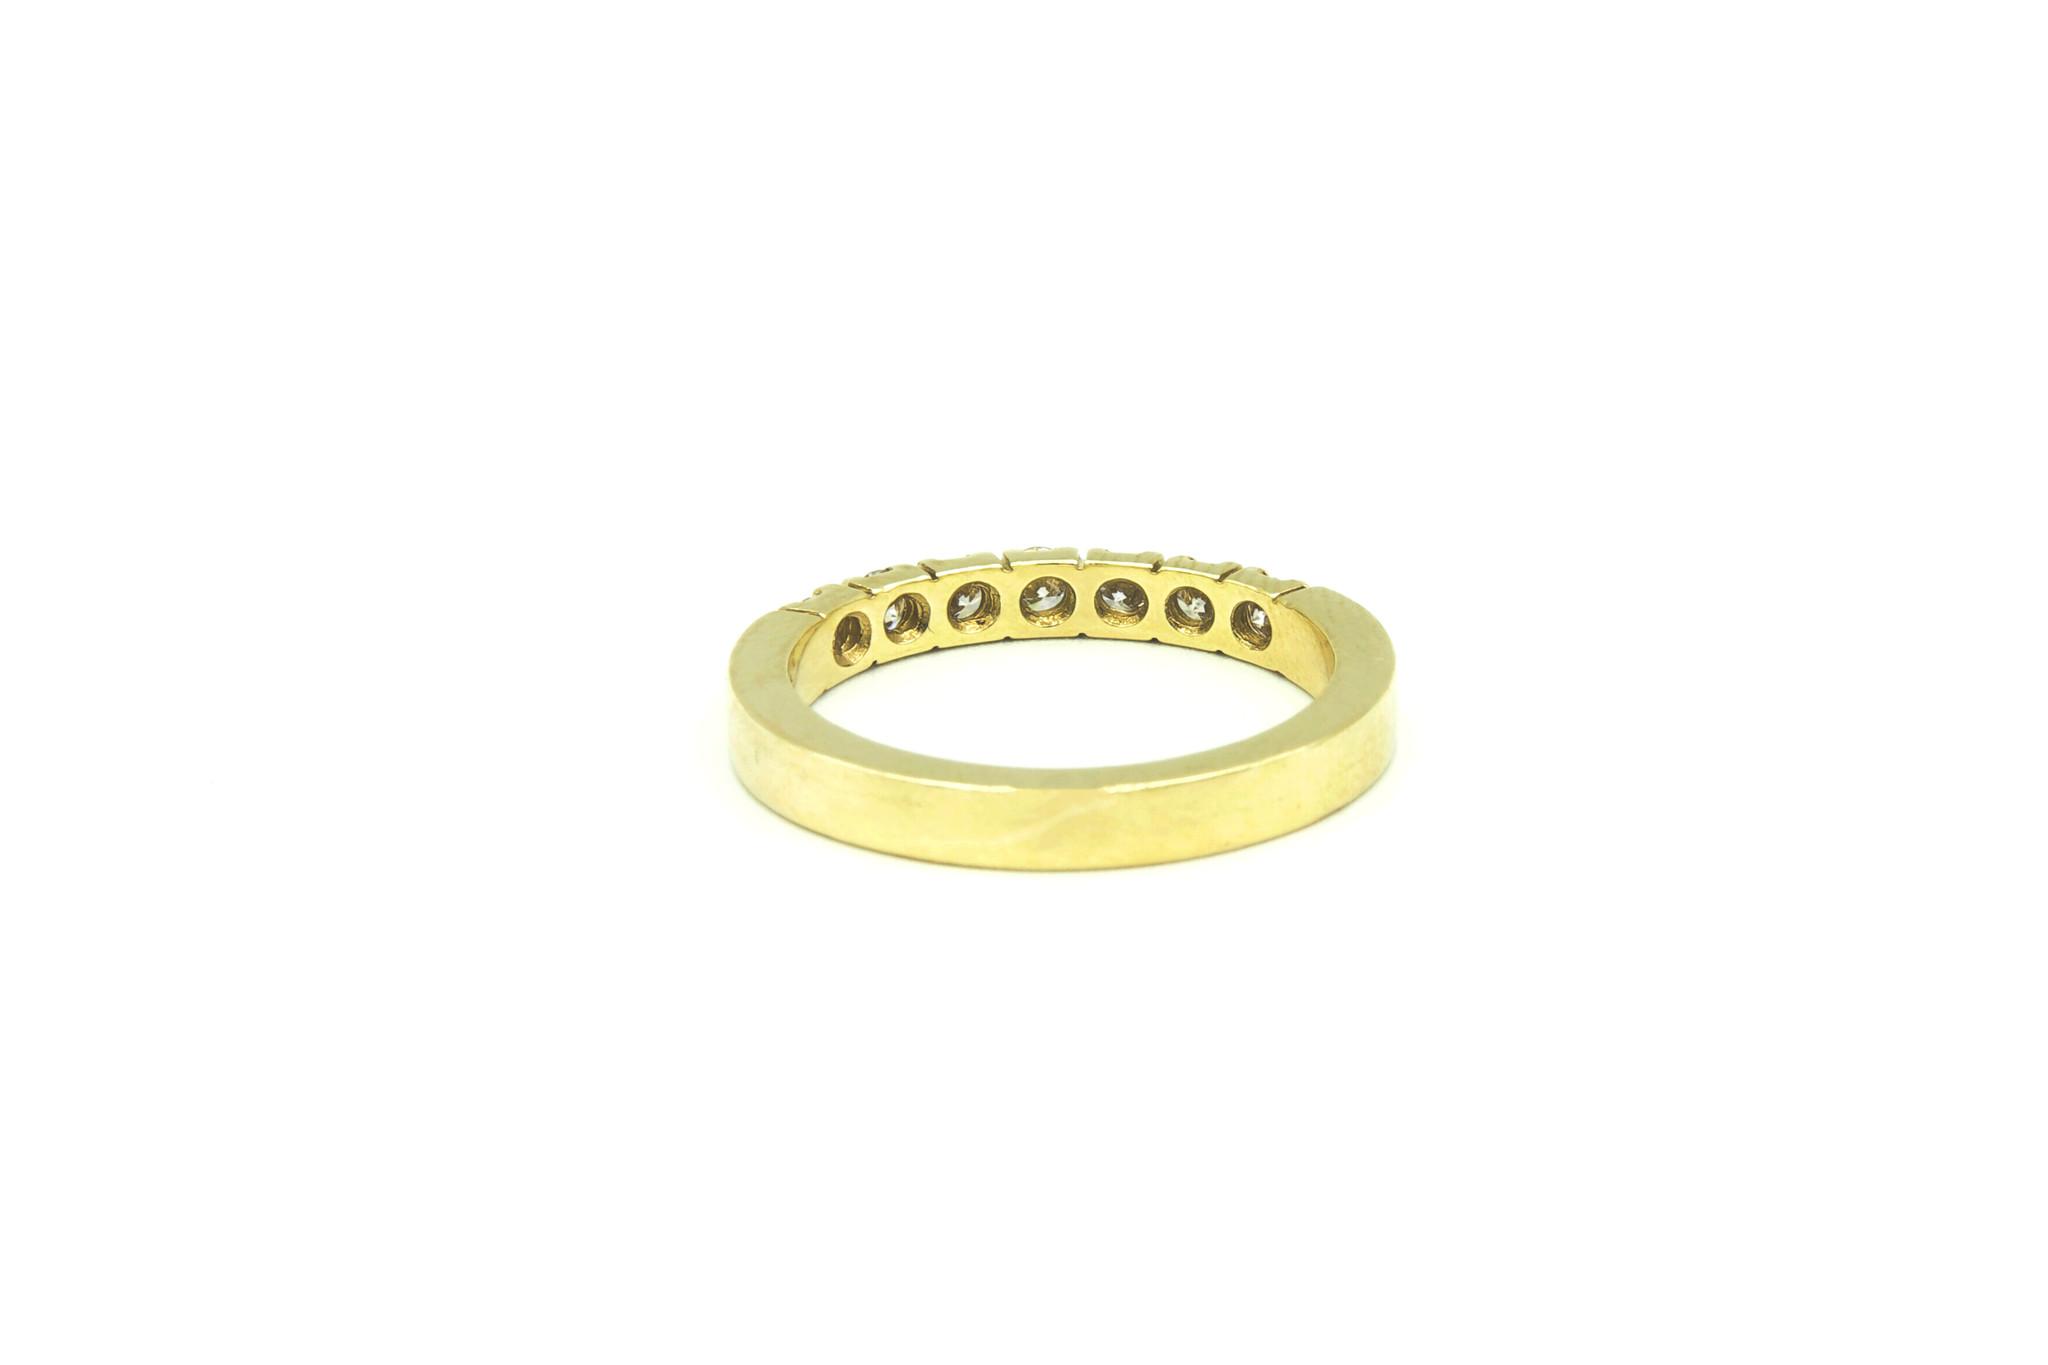 Ring verlovingsring klassiek met 7 diamanten ingezet-3